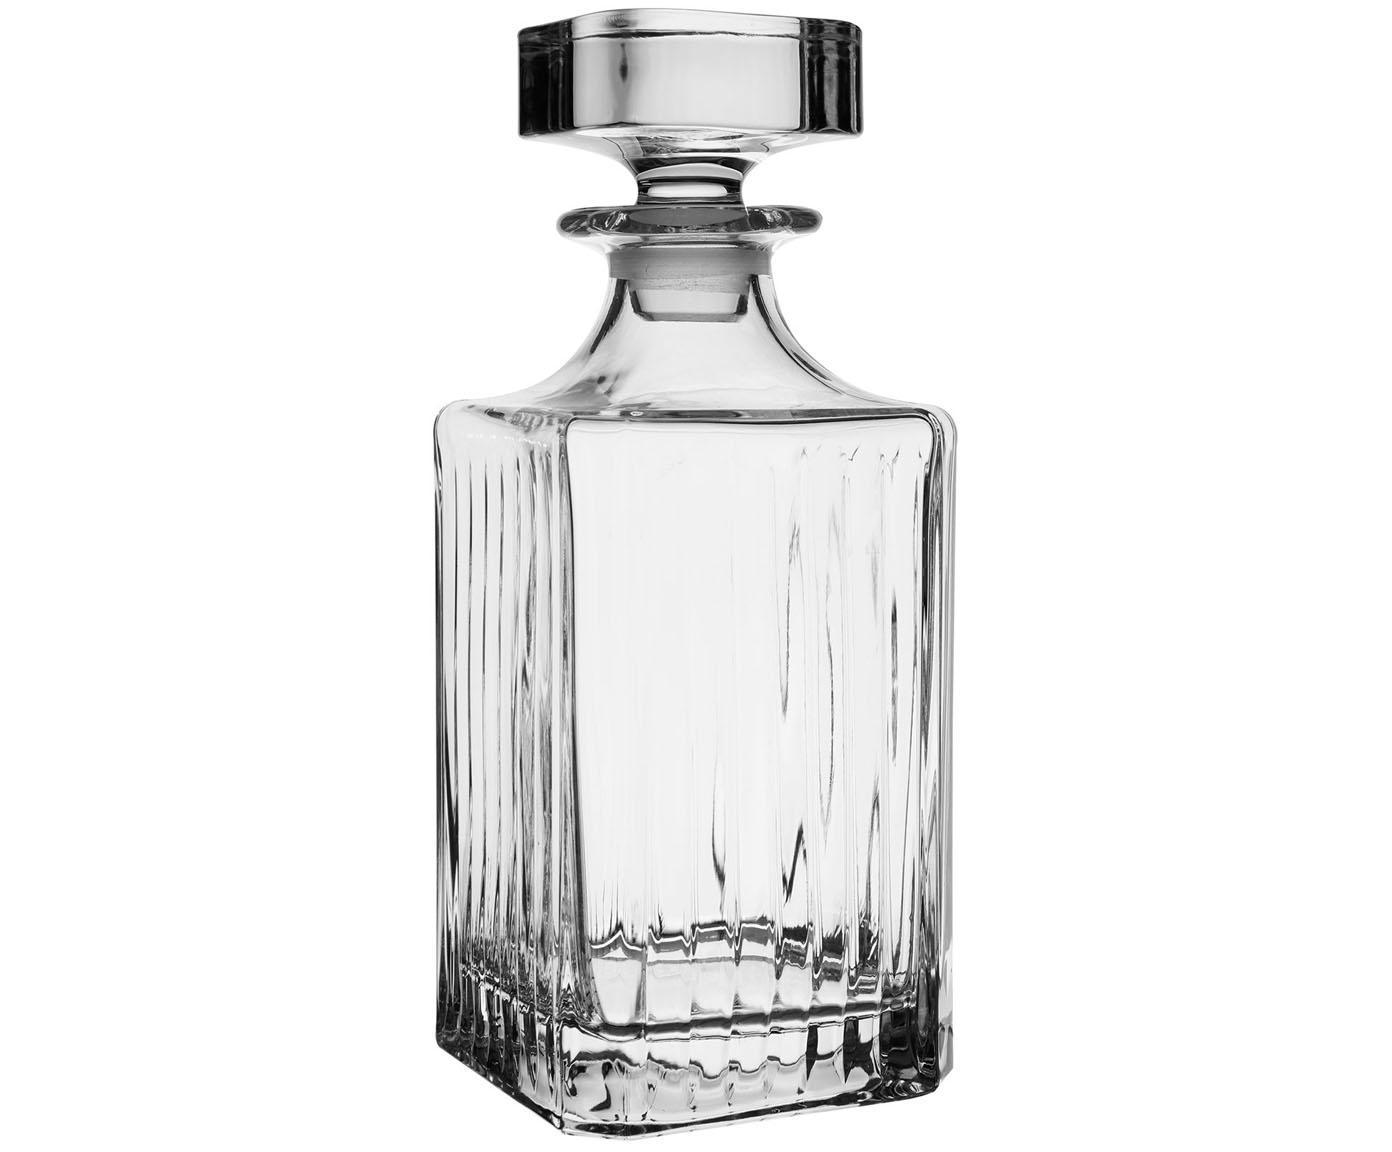 Kristall-Dekanter Timeless, Kristallglas, Transparent, H 24 cm